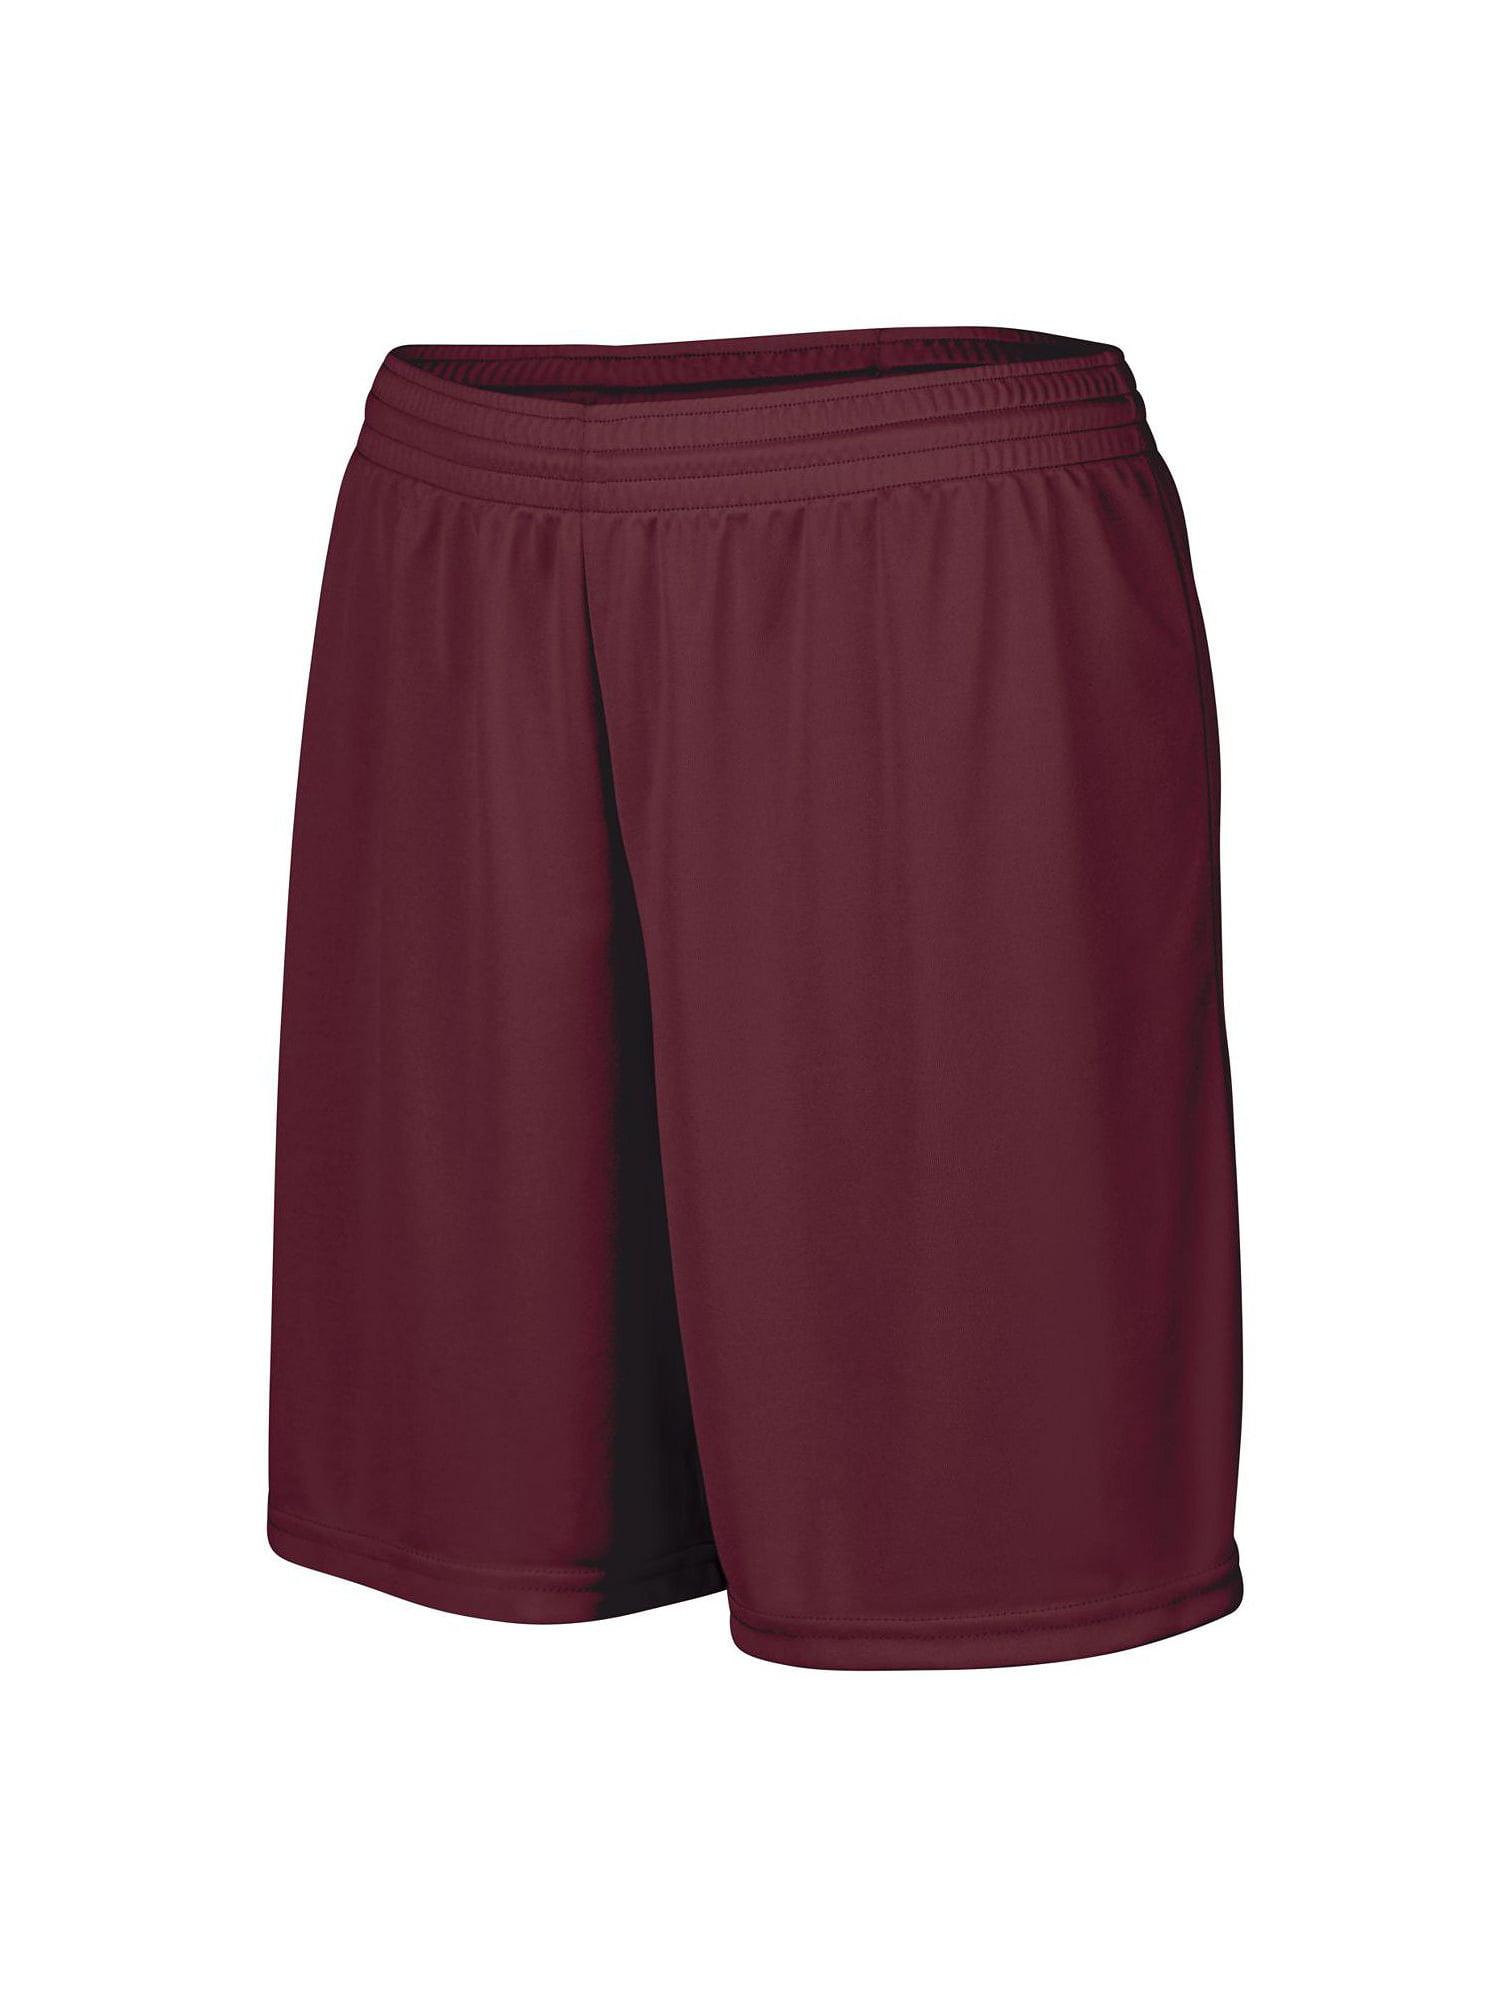 Augusta Sportswear Girls' Octane Short 1424